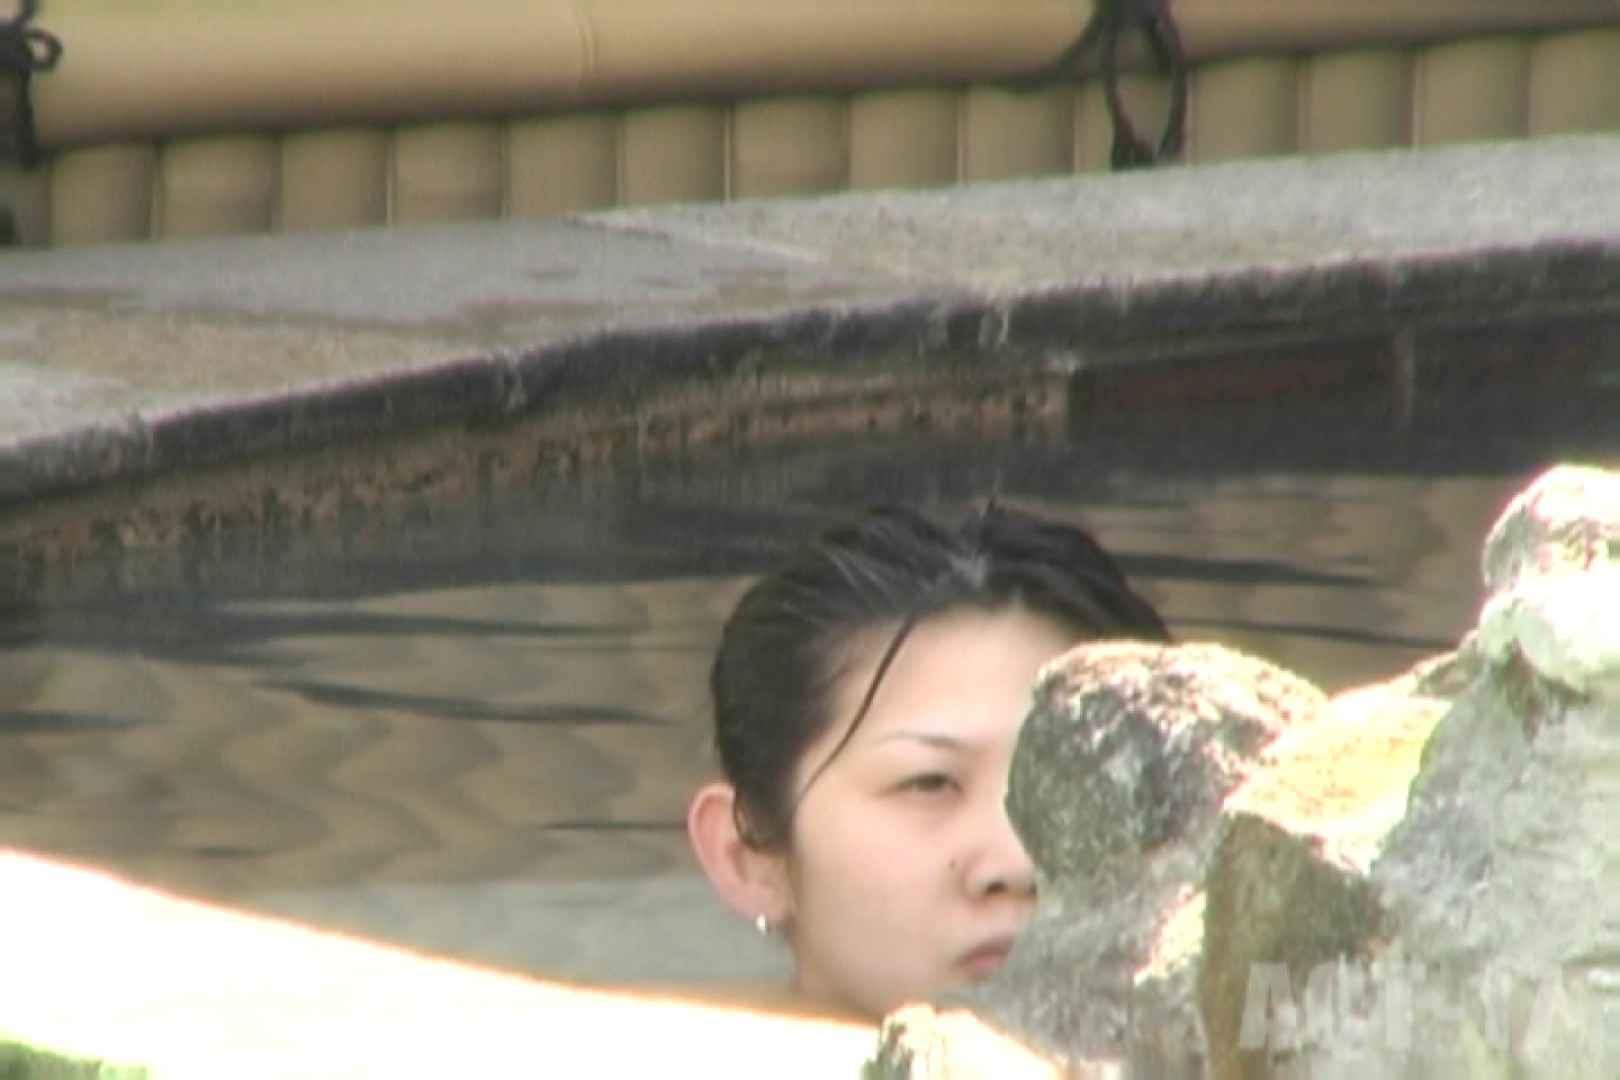 Aquaな露天風呂Vol.850 OLのエロ生活 | 露天風呂  76連発 37